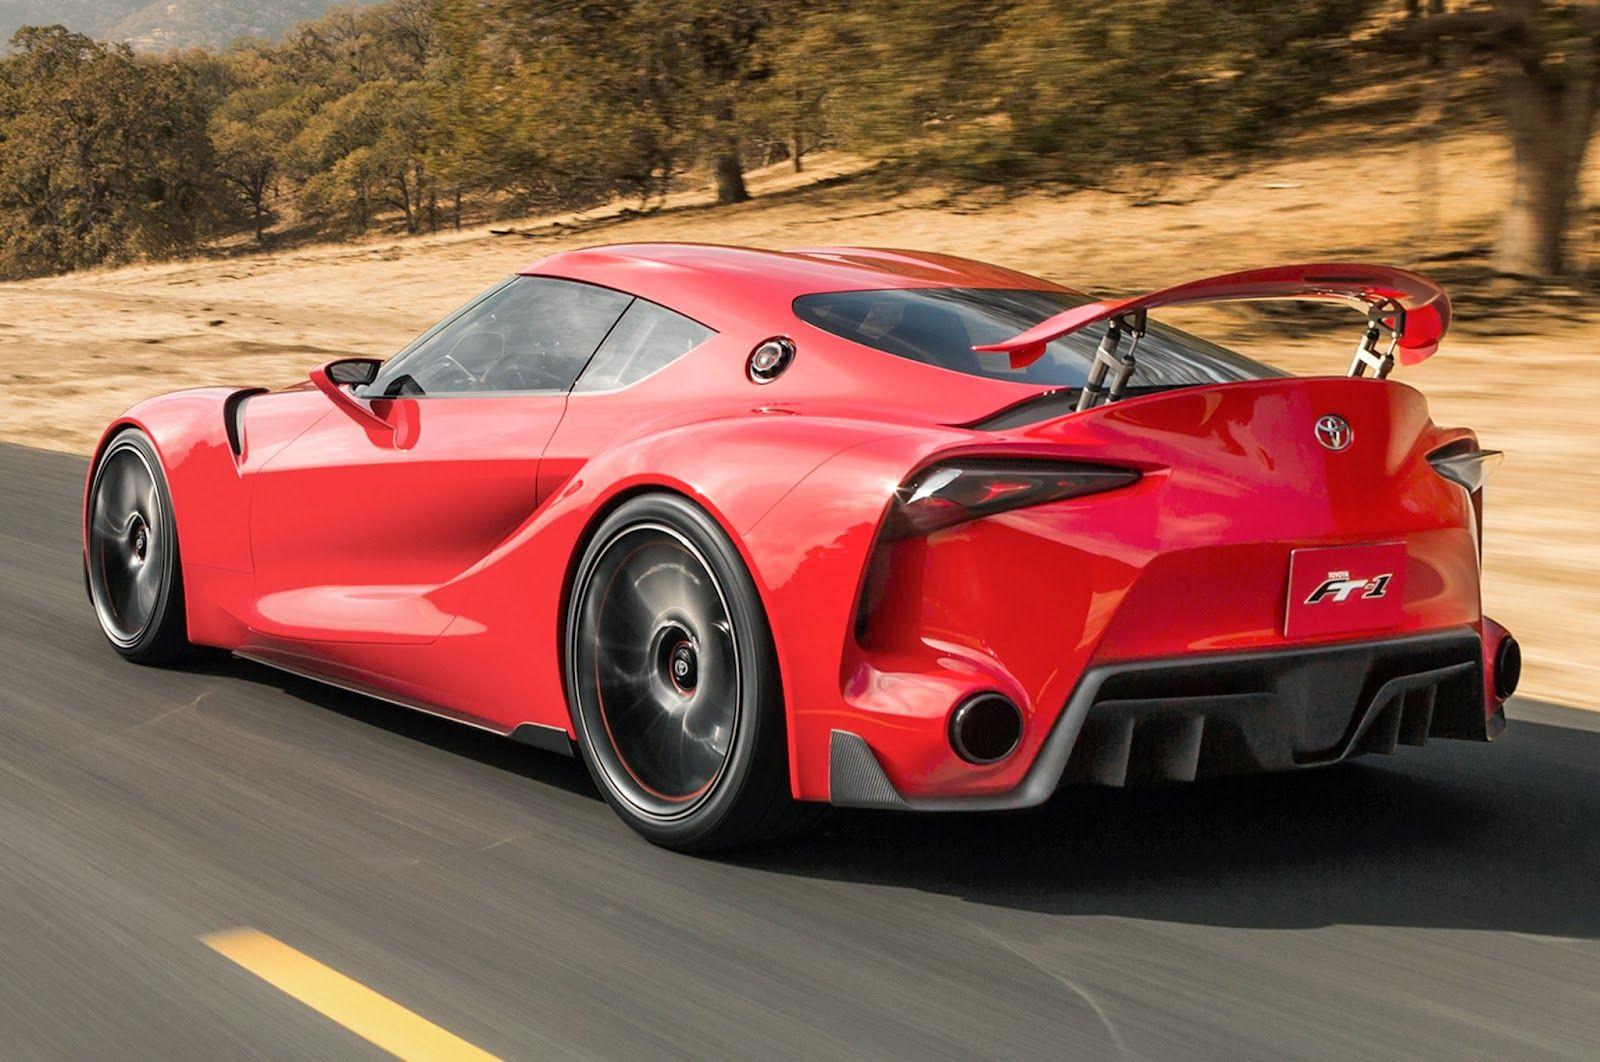 2015 Toyota Supra. | Auto | Pinterest | Toyota supra, Toyota and Cars